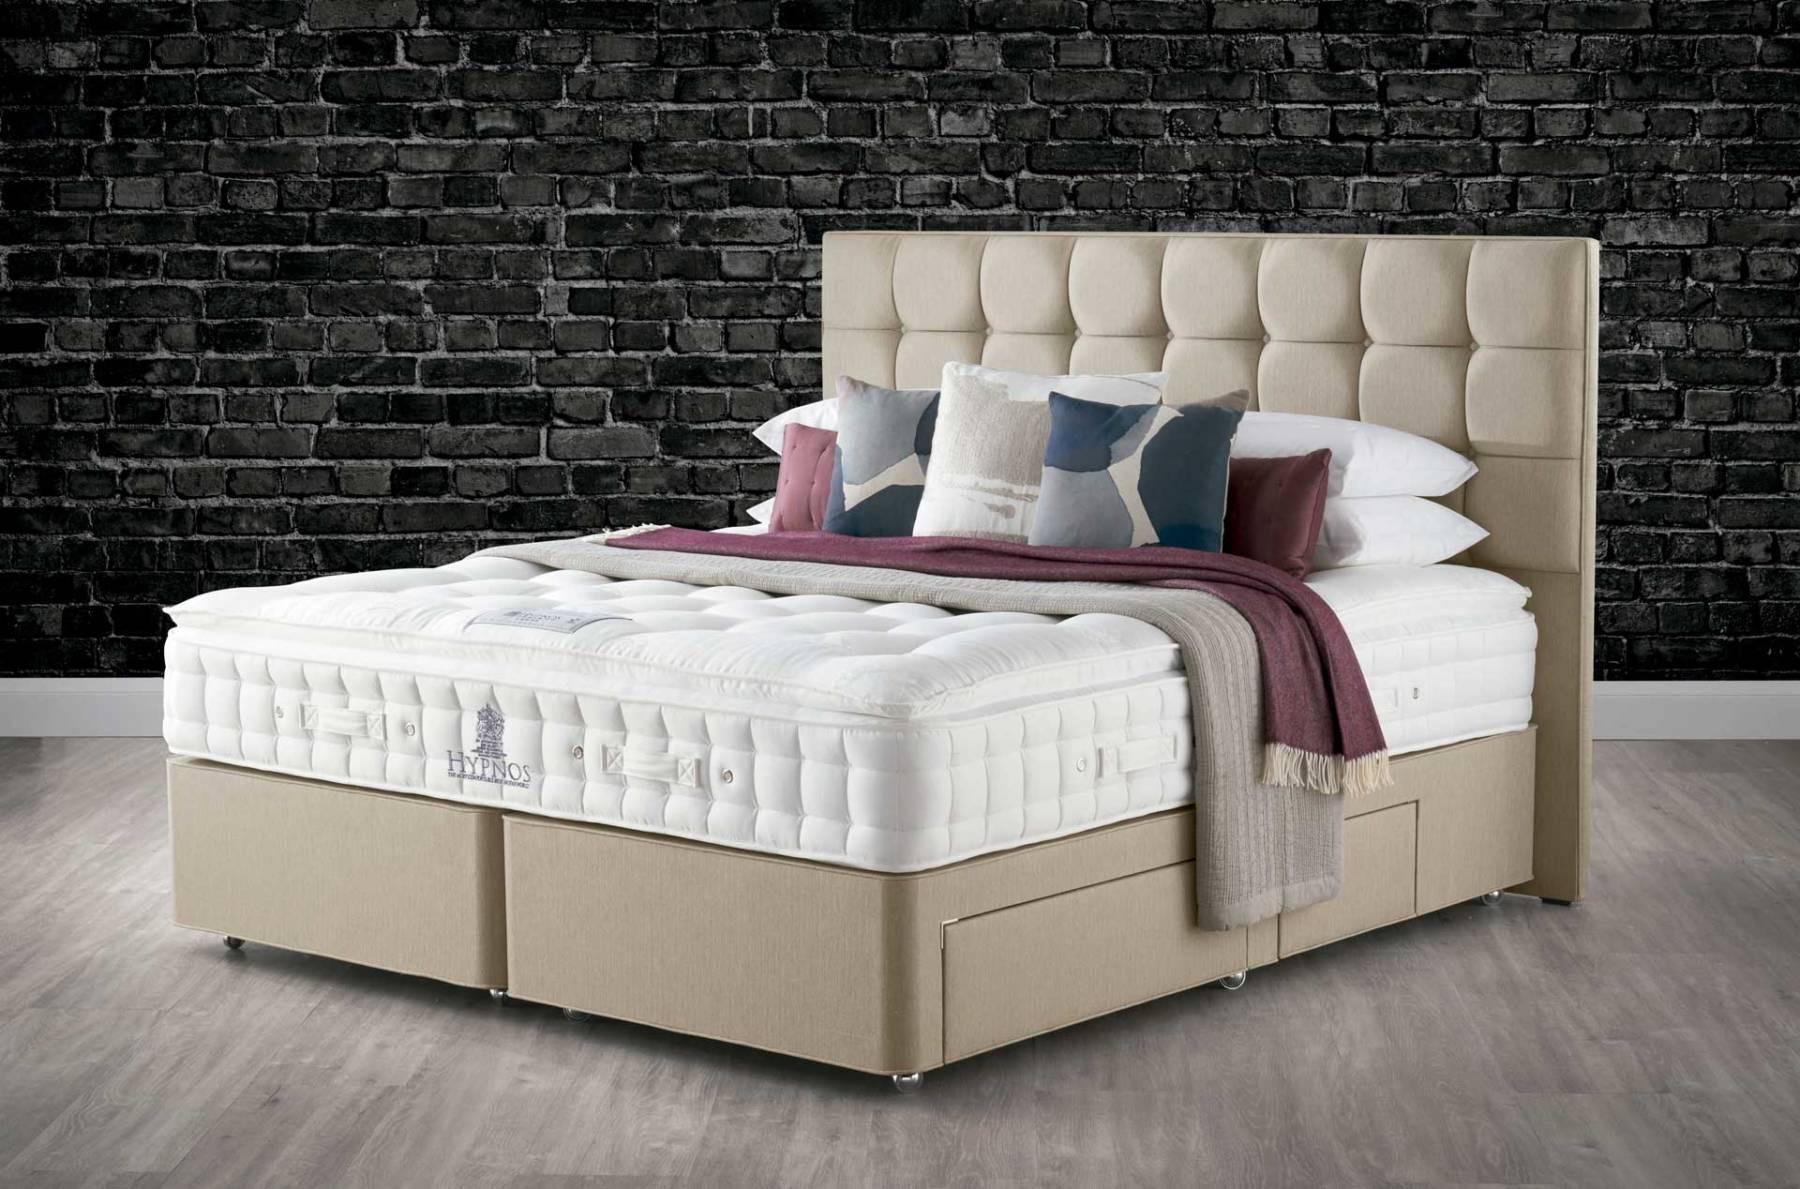 Cama Hypnos Aspire Relax | LUXSON BEDS